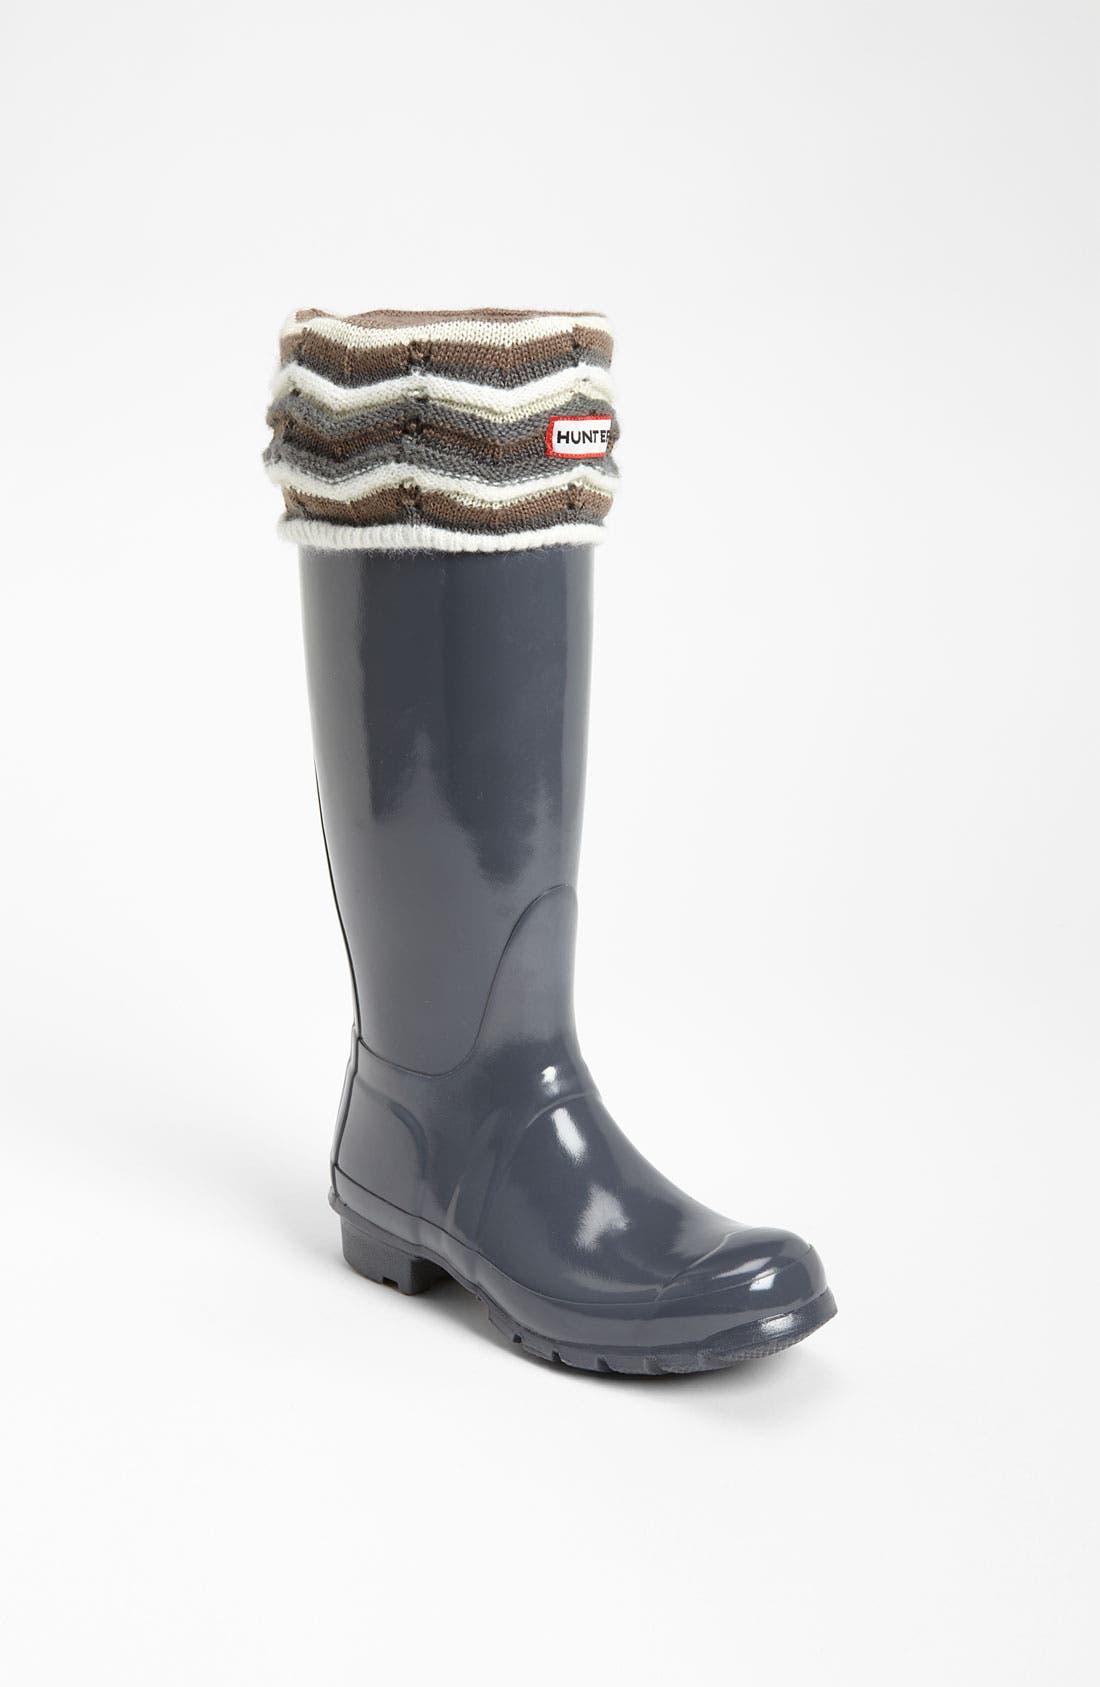 Main Image - Hunter Tall Gloss Rain Boot & Zigzag Cuff Welly Socks